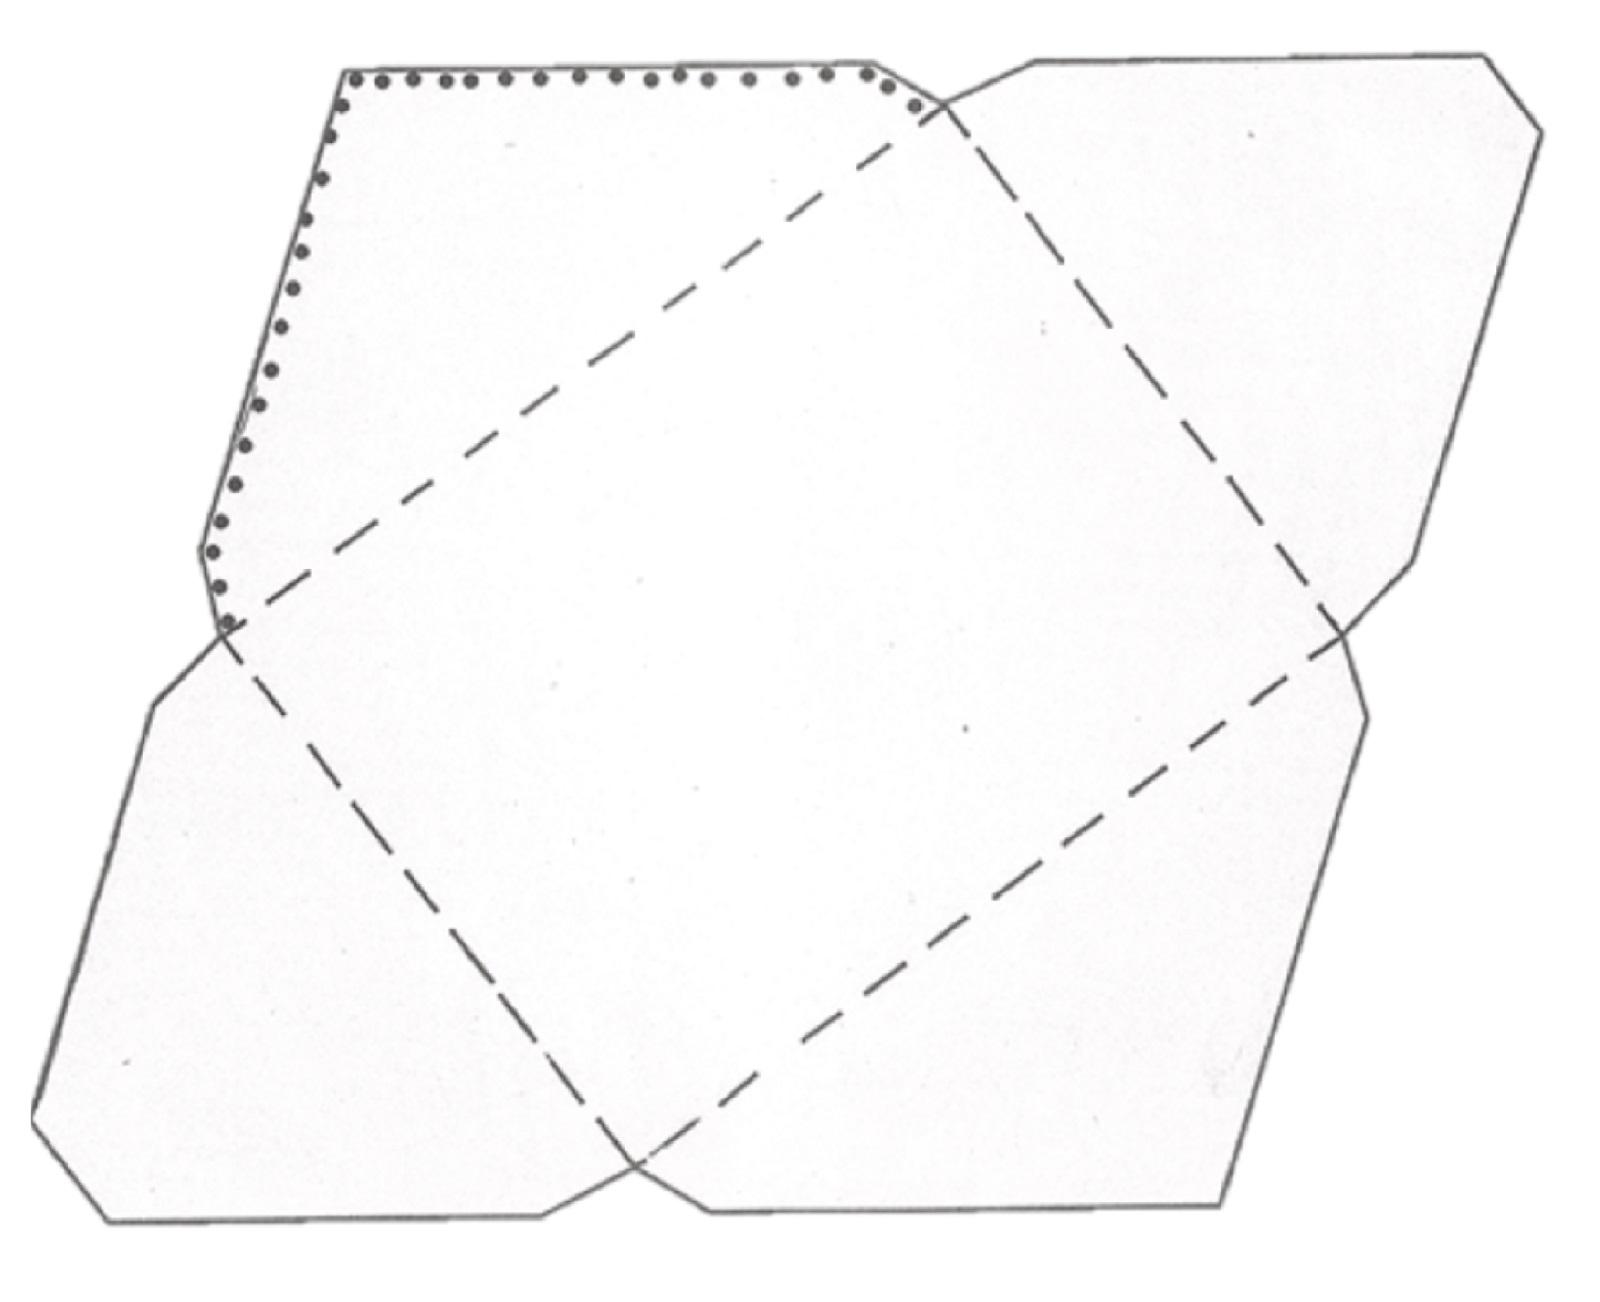 001 Top 5x7 Envelope Template Word Image  Microsoft FreeFull